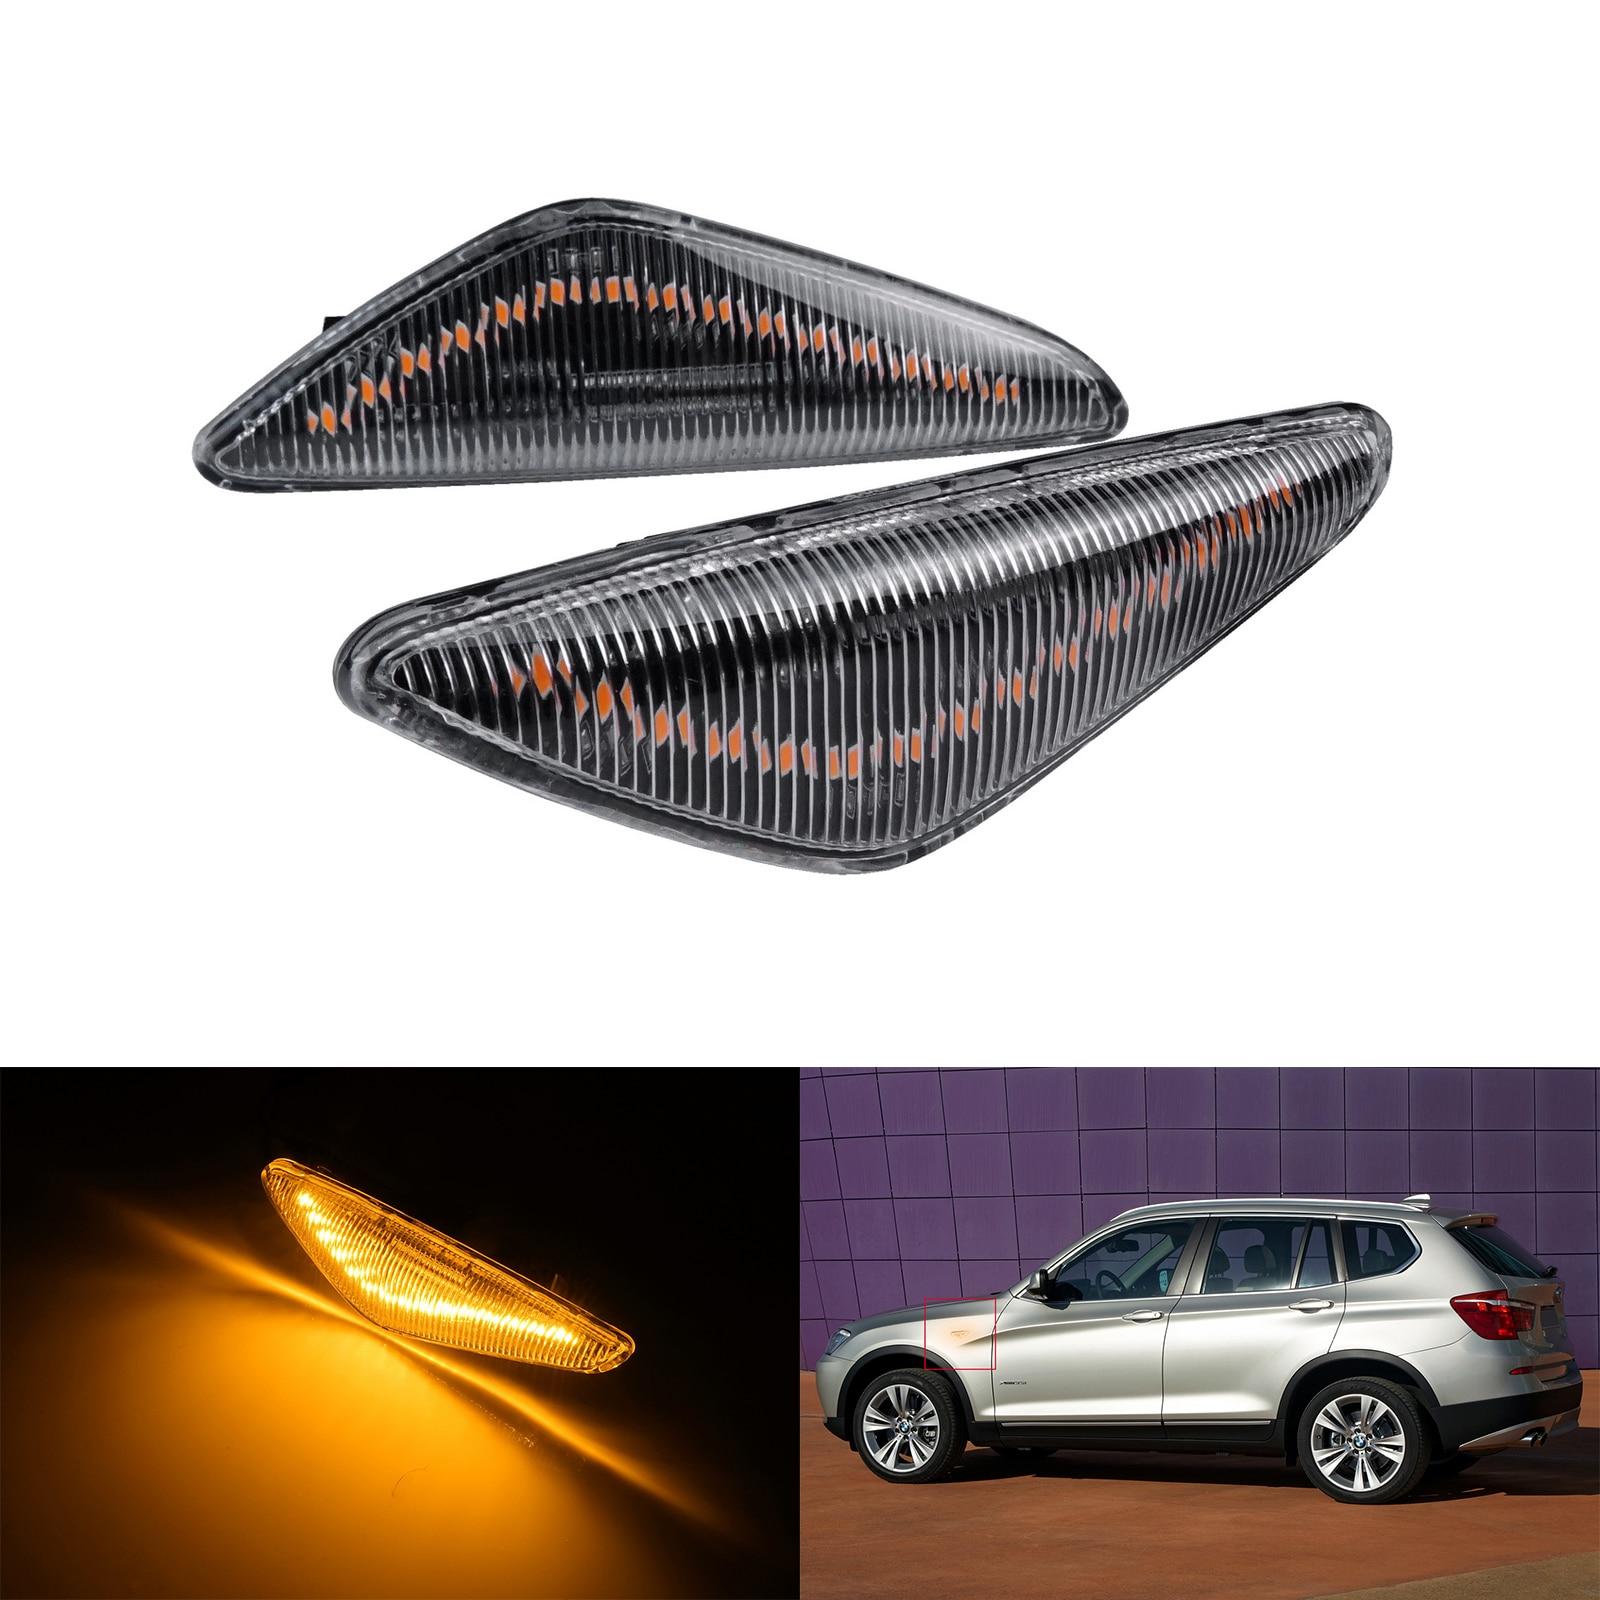 ANGRONG 2X For BMW X3 F25 X5 E70 X6 E71 Clear Lens Side Indicator LED Repeater Light Amber